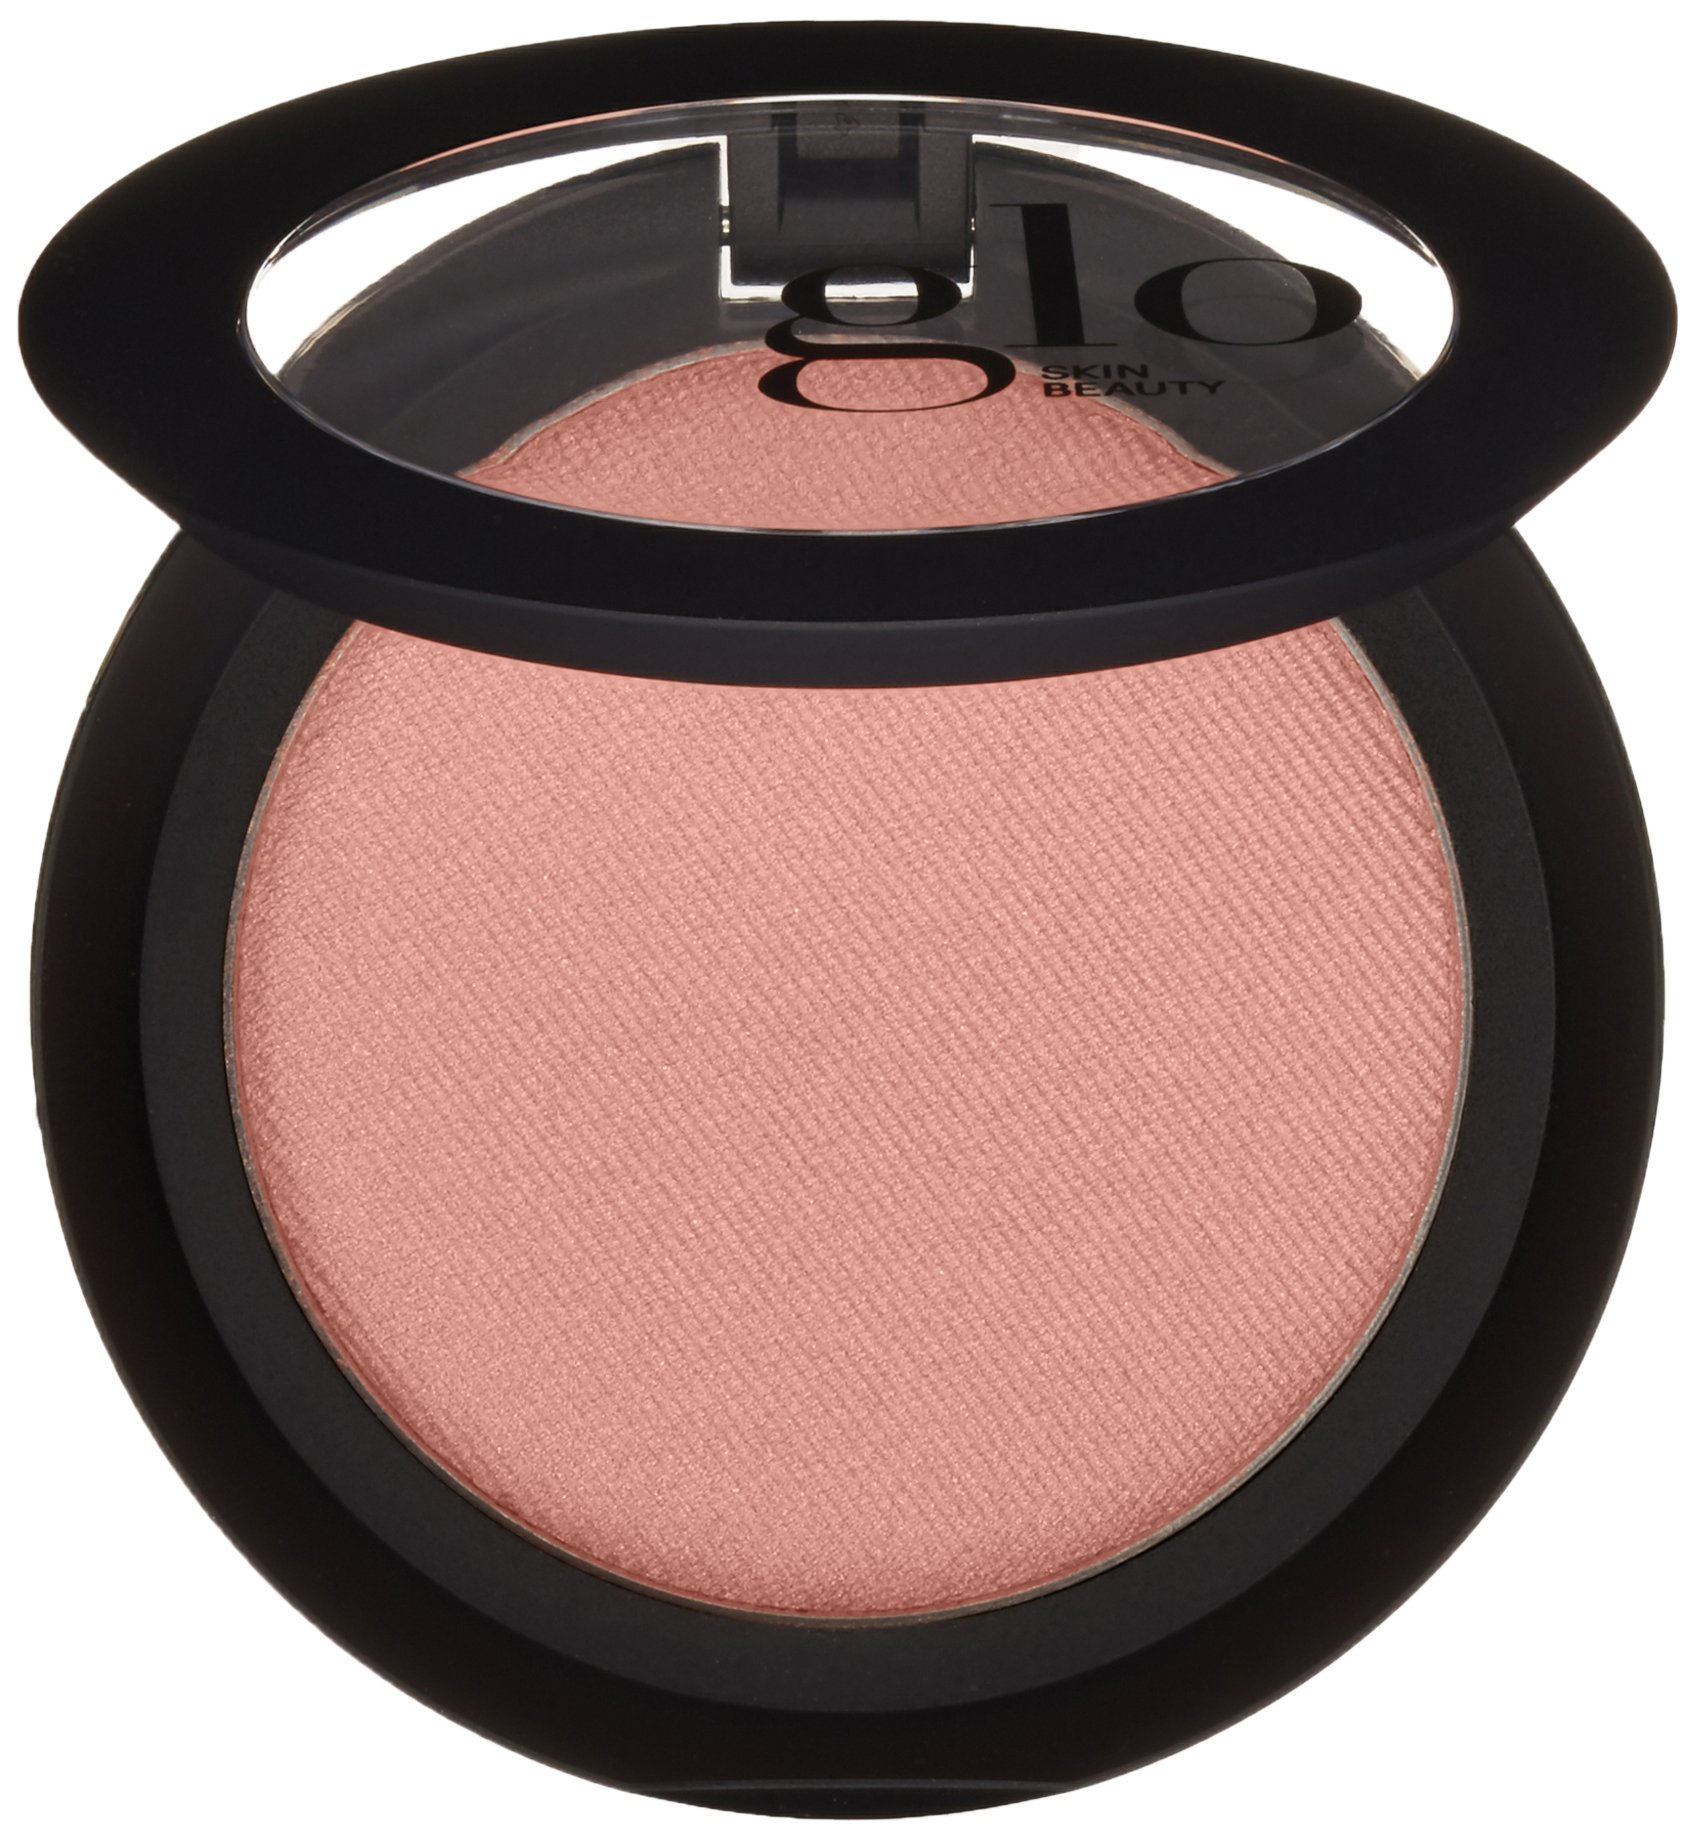 Glo Skin Beauty Blush - Sheer Petal, Talc Free Mineral Makeup Blush, 9 Shades | Cruelty Free